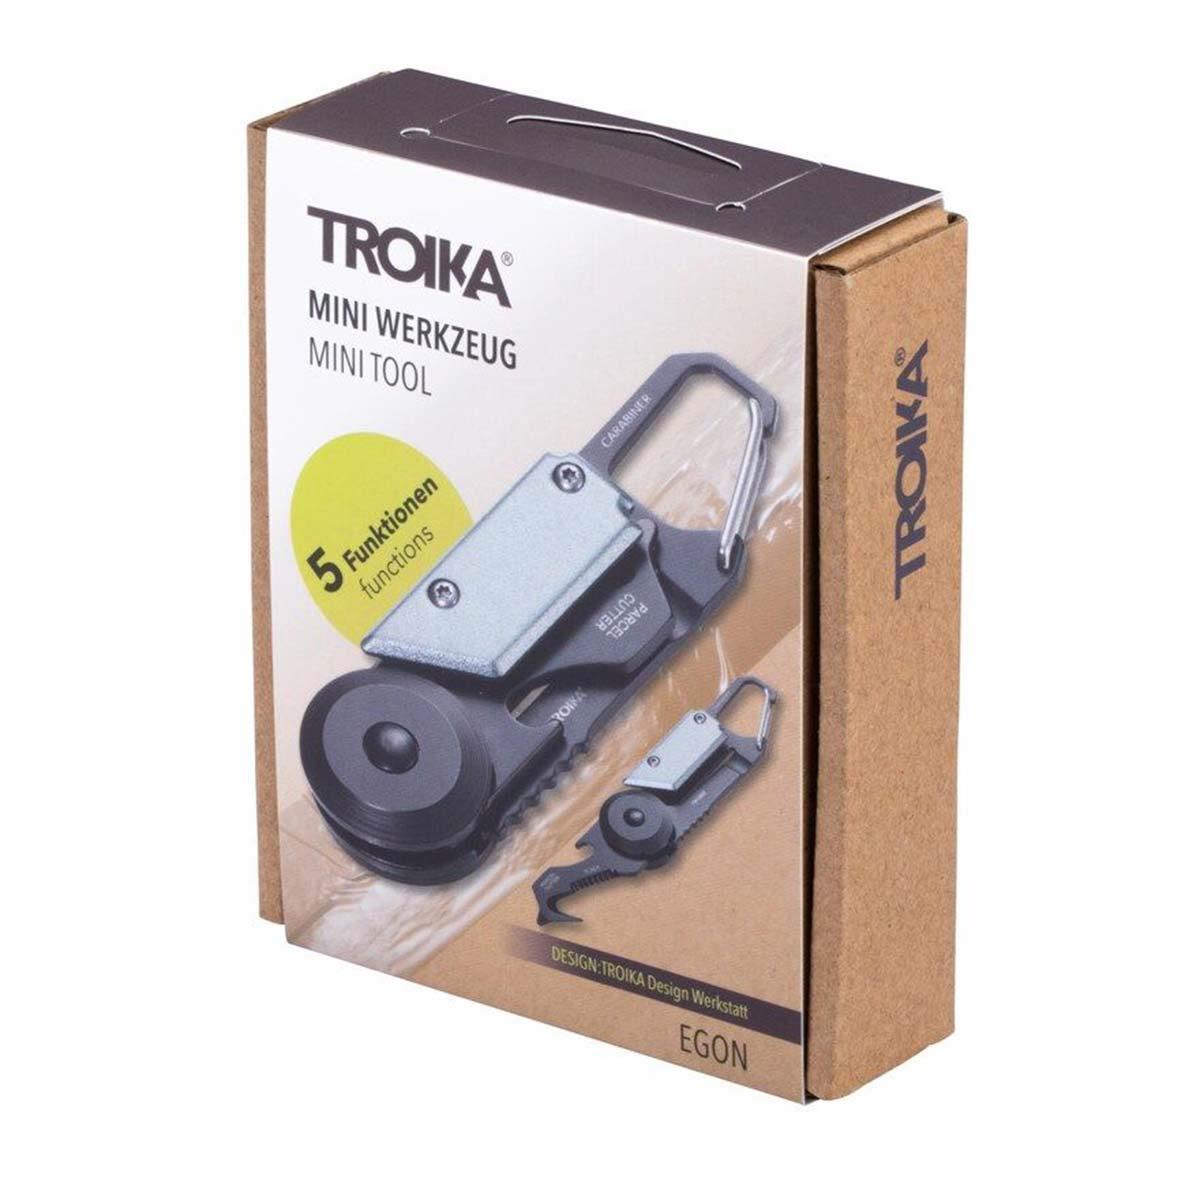 Troika μπρελόκ mini tool